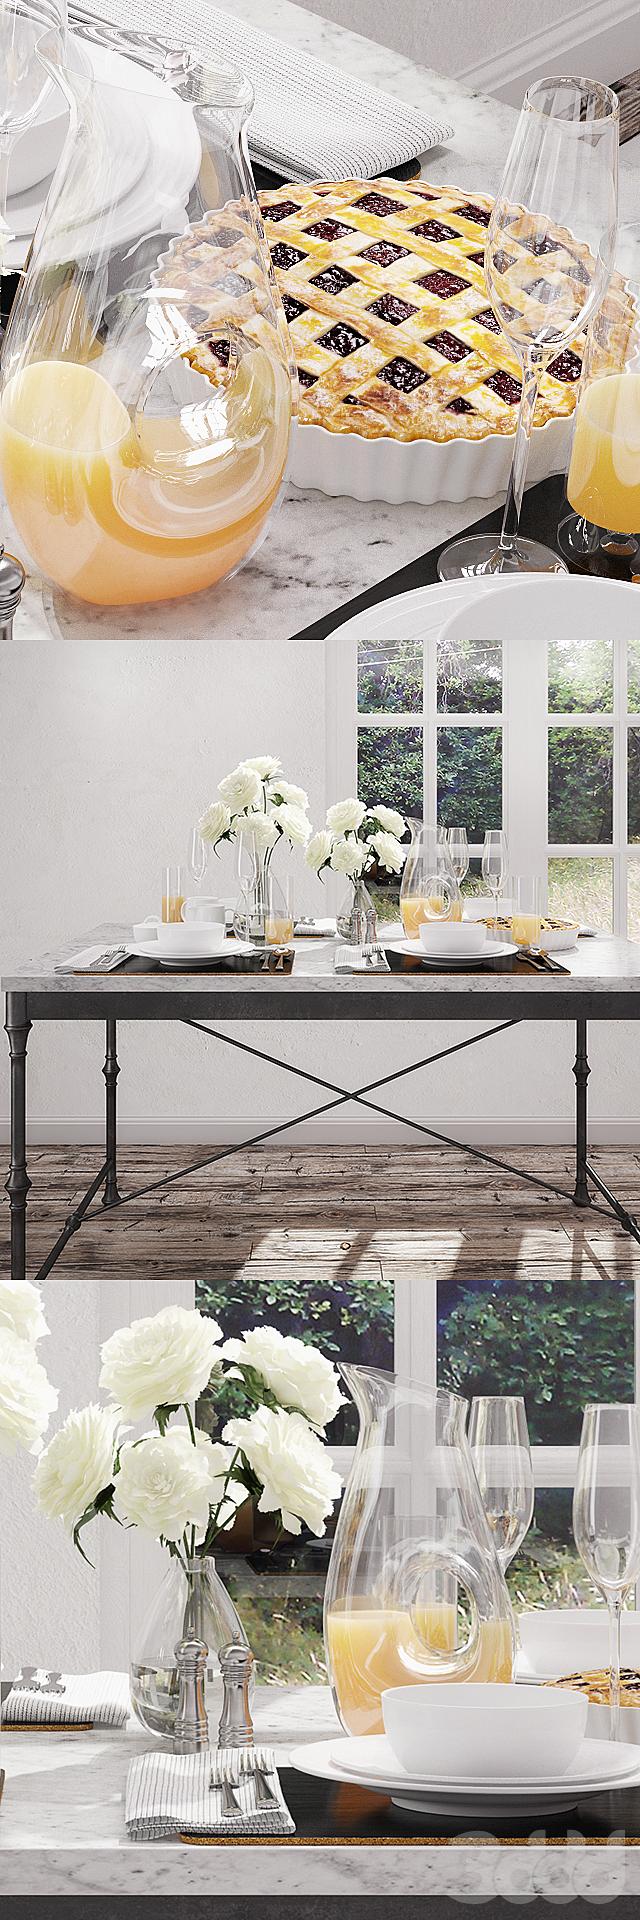 Tableware by Crate&Barrel